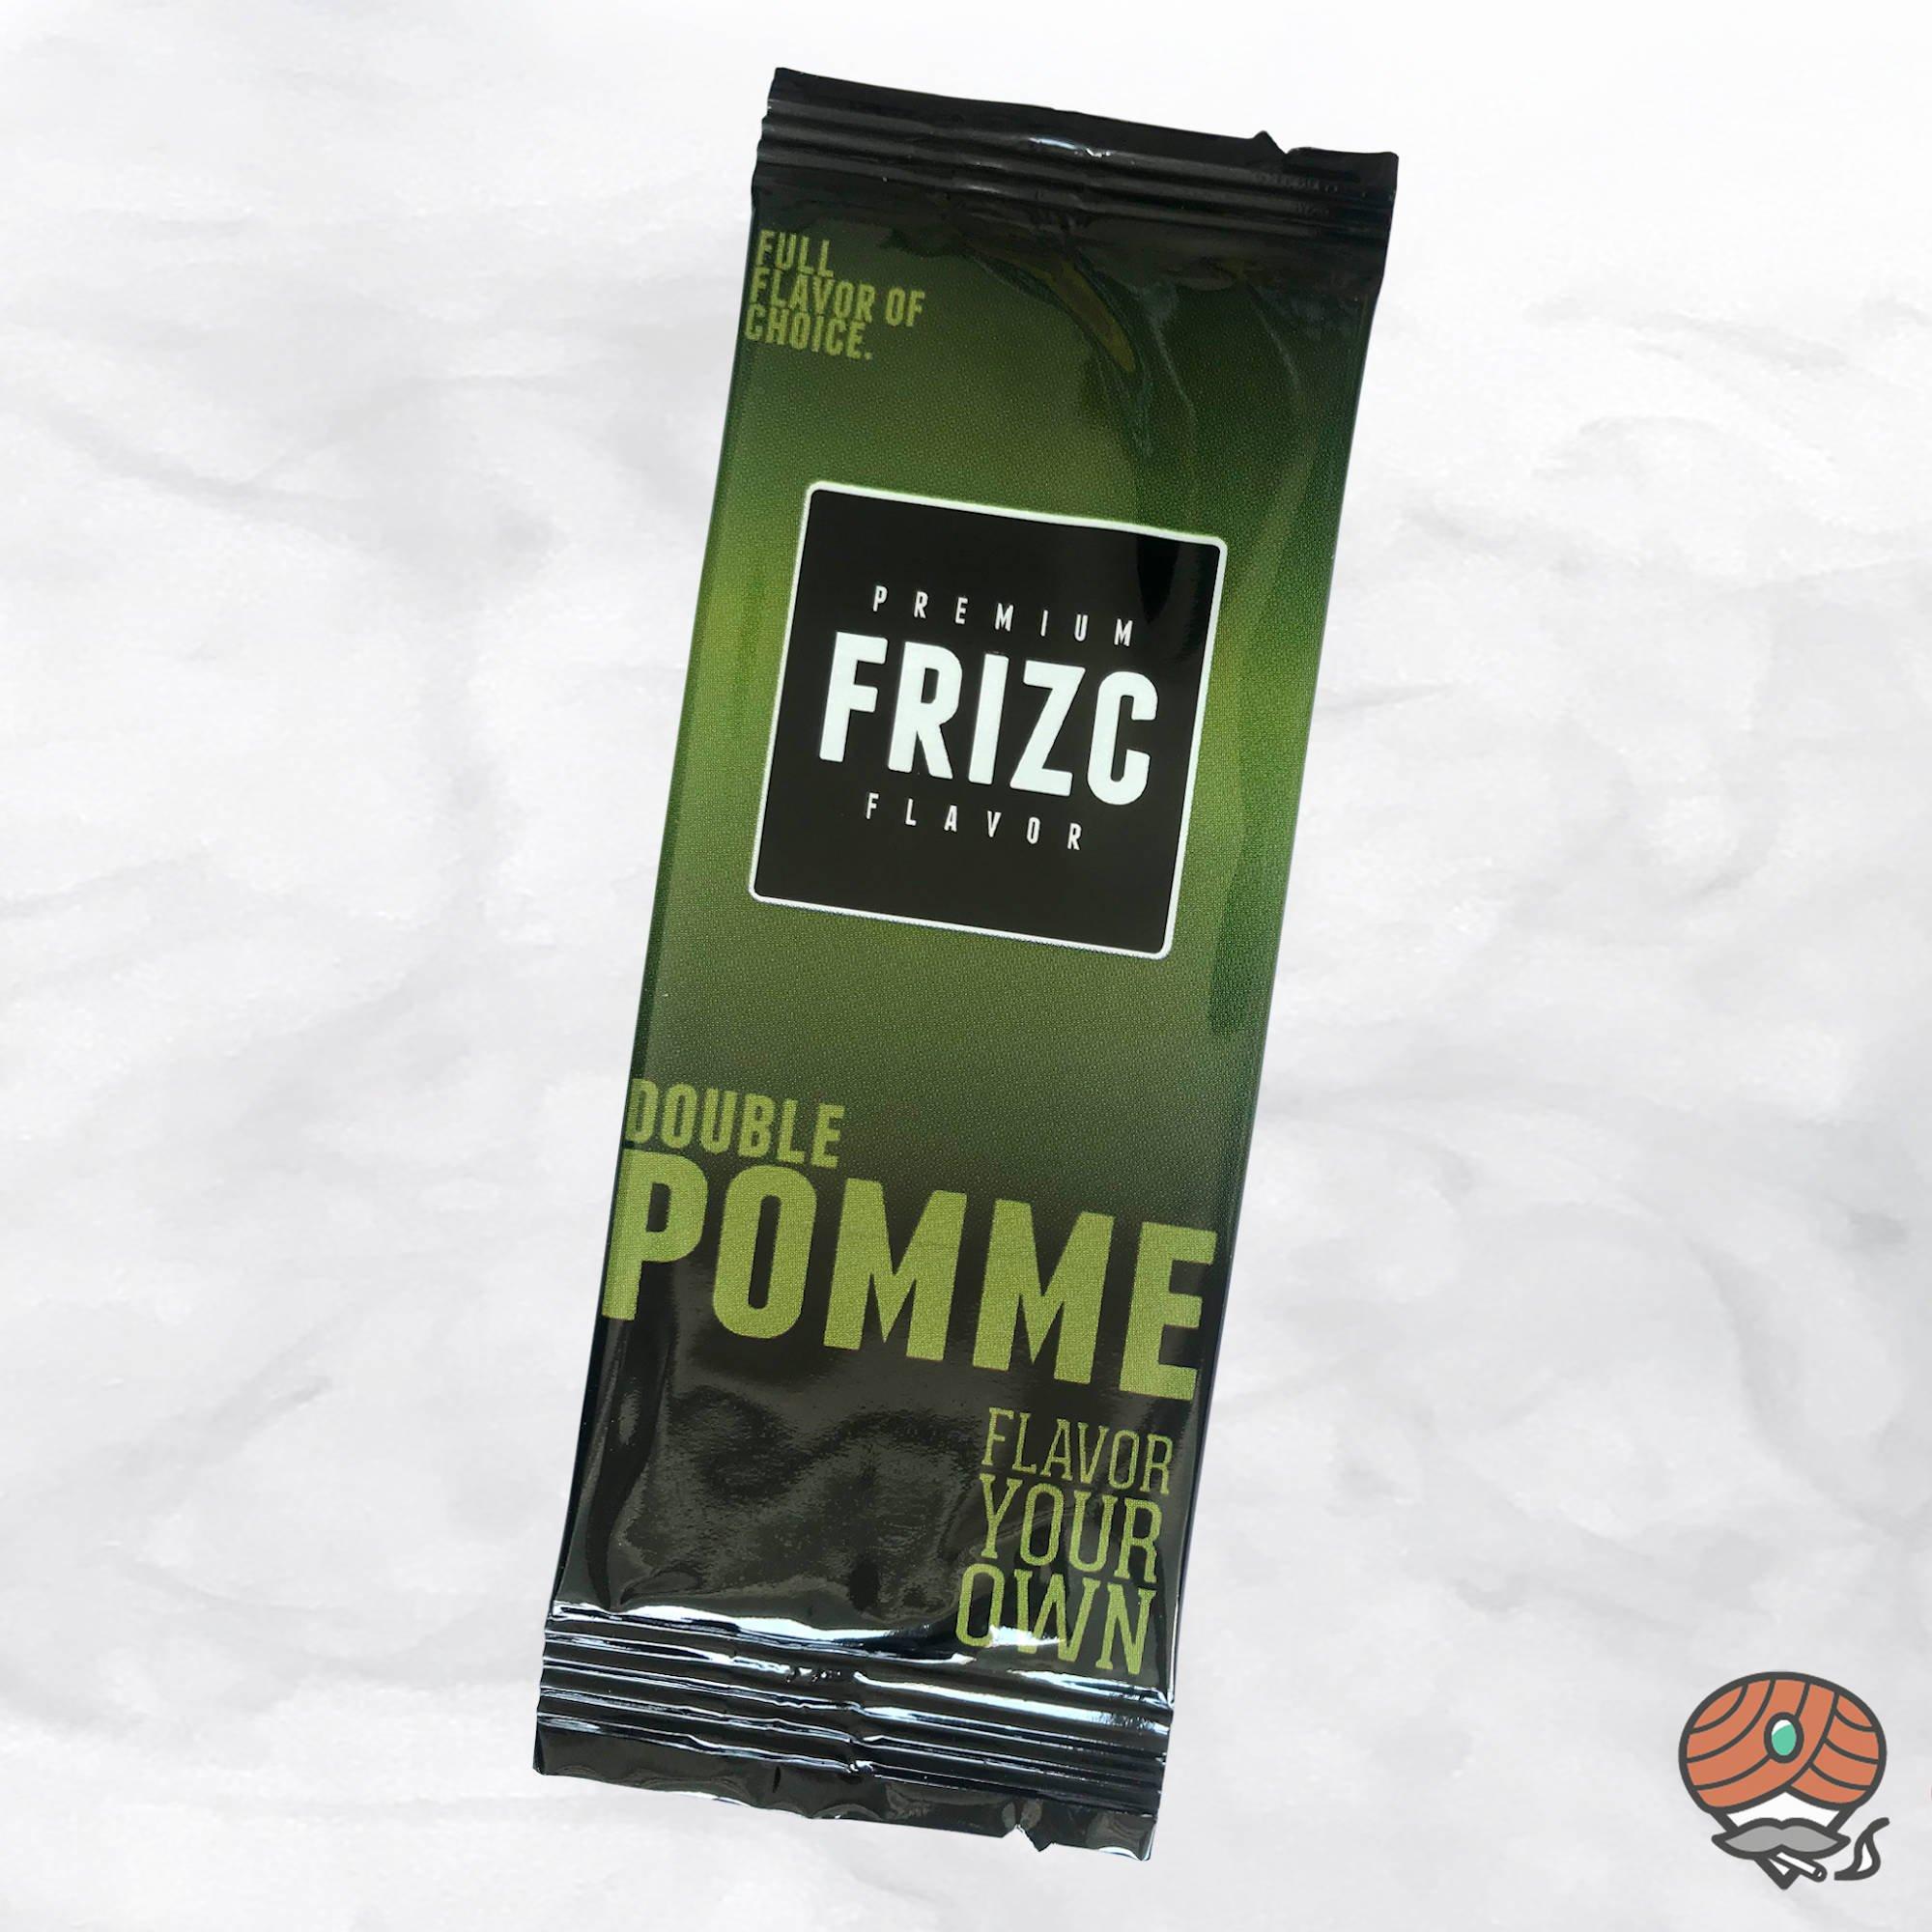 Aromakarte Frizc Double Pomme (Apfel) - Premium Flavor Card